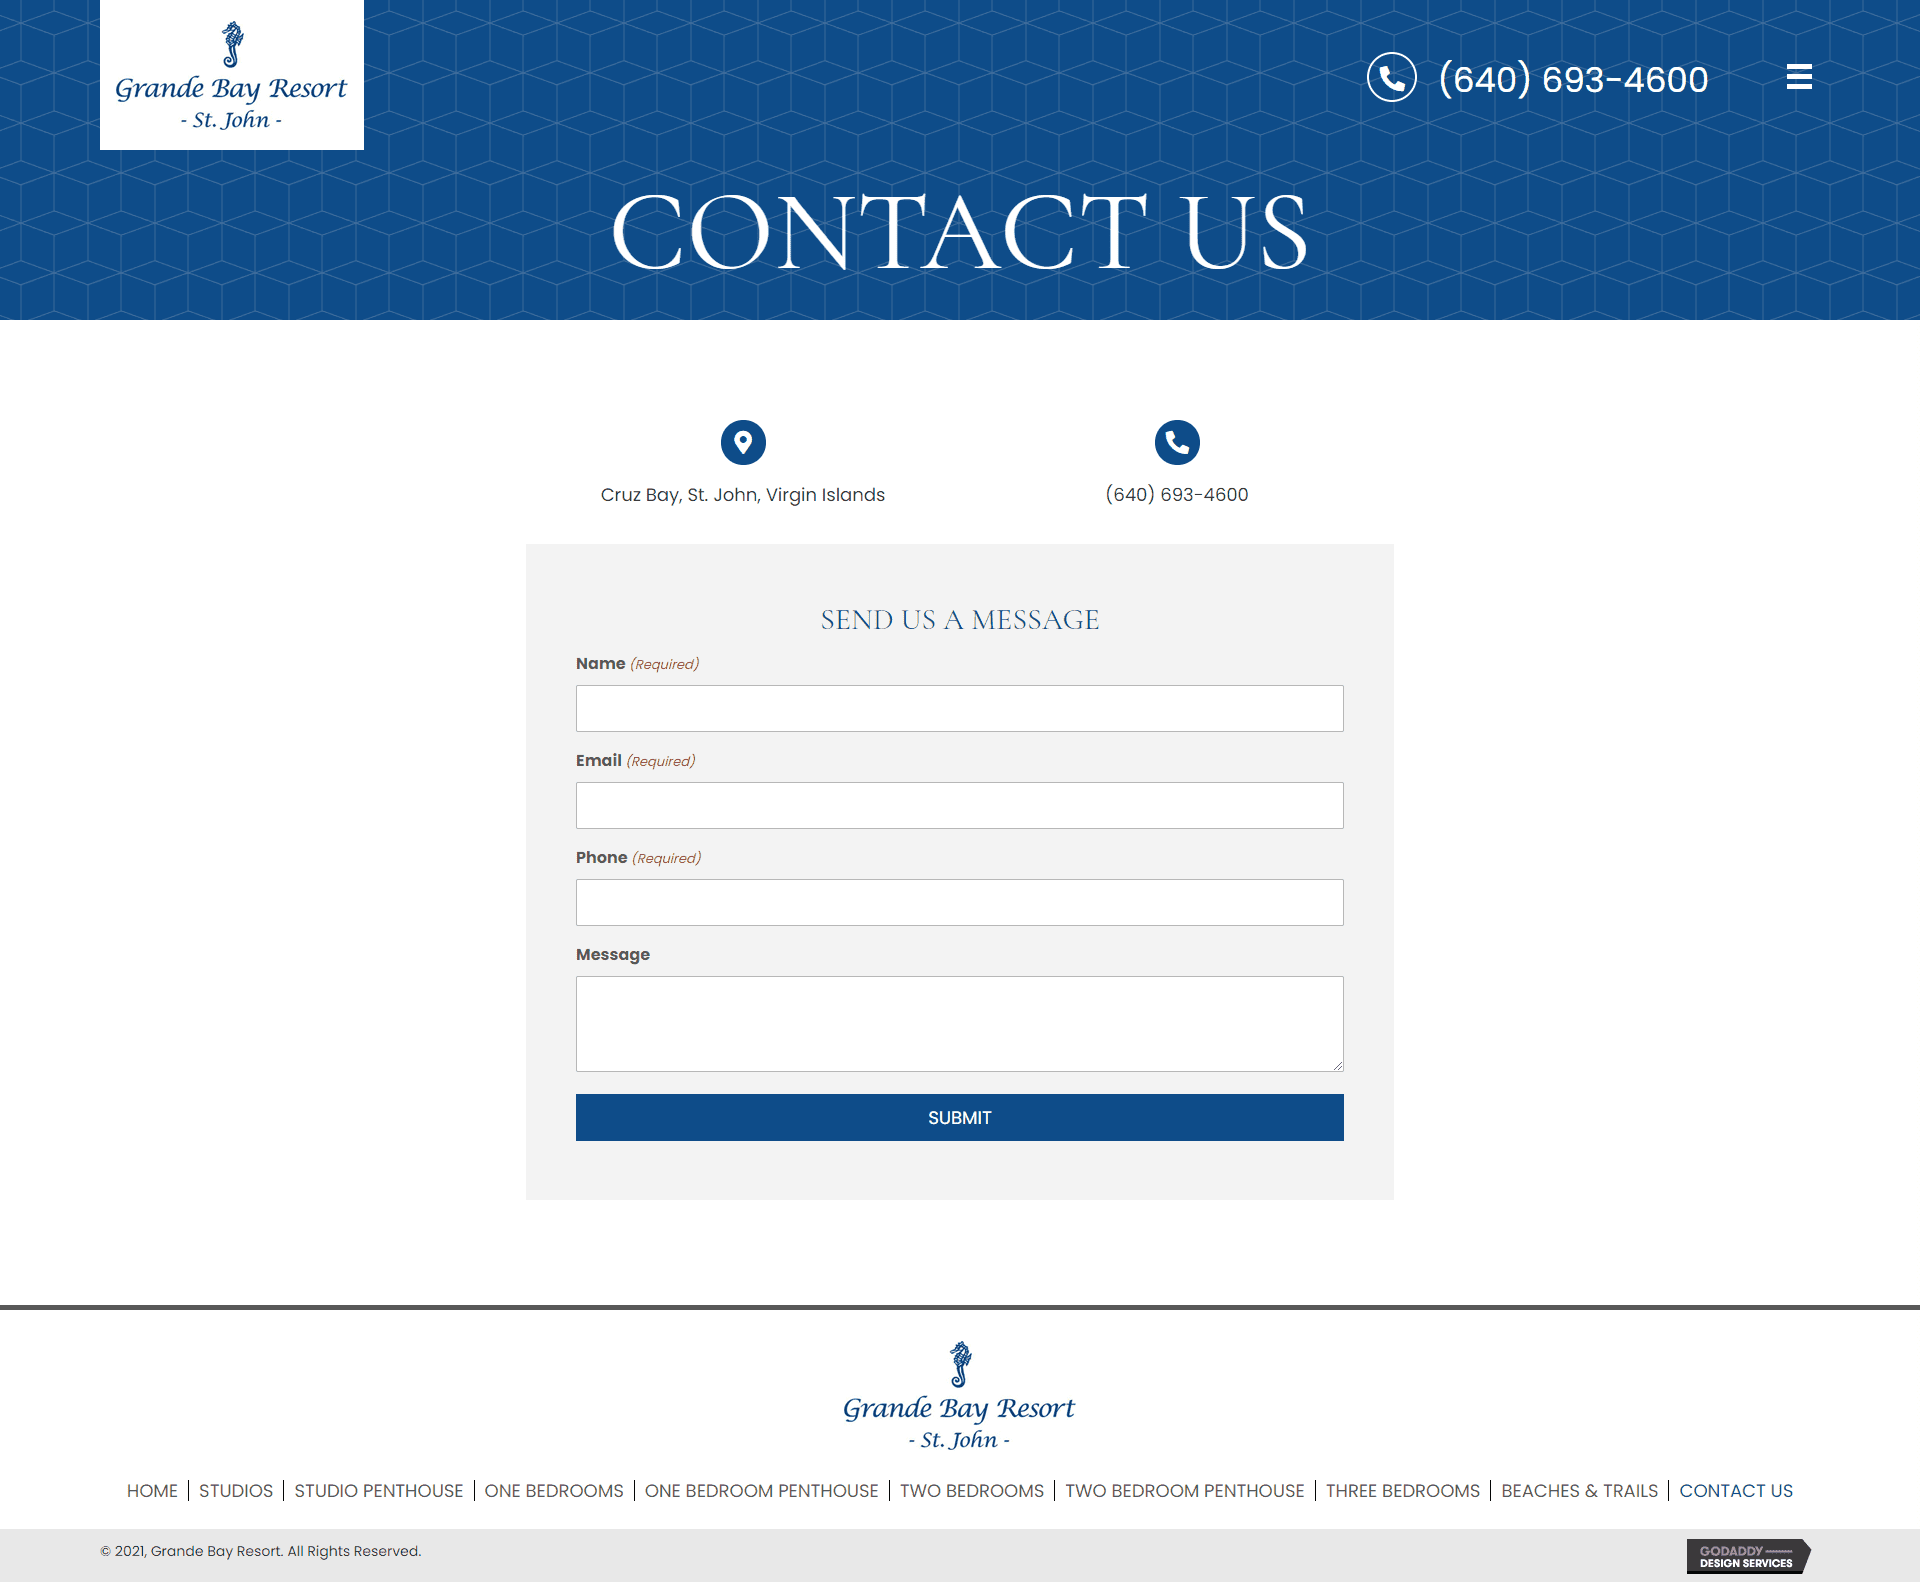 Grande Bay Resort Contact